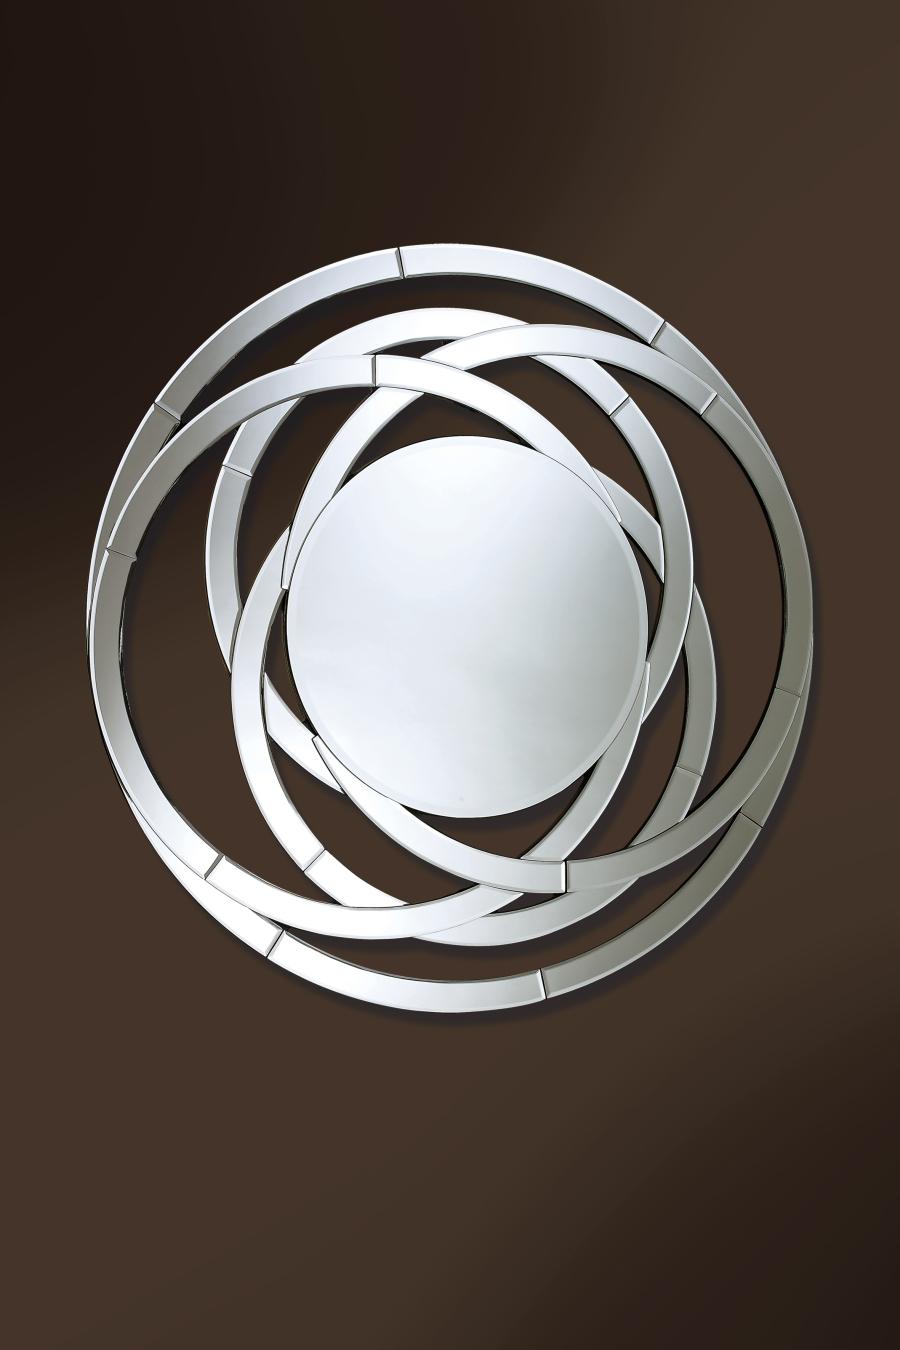 Espejo moderno de cristal 6 - Villalba Interiorismo